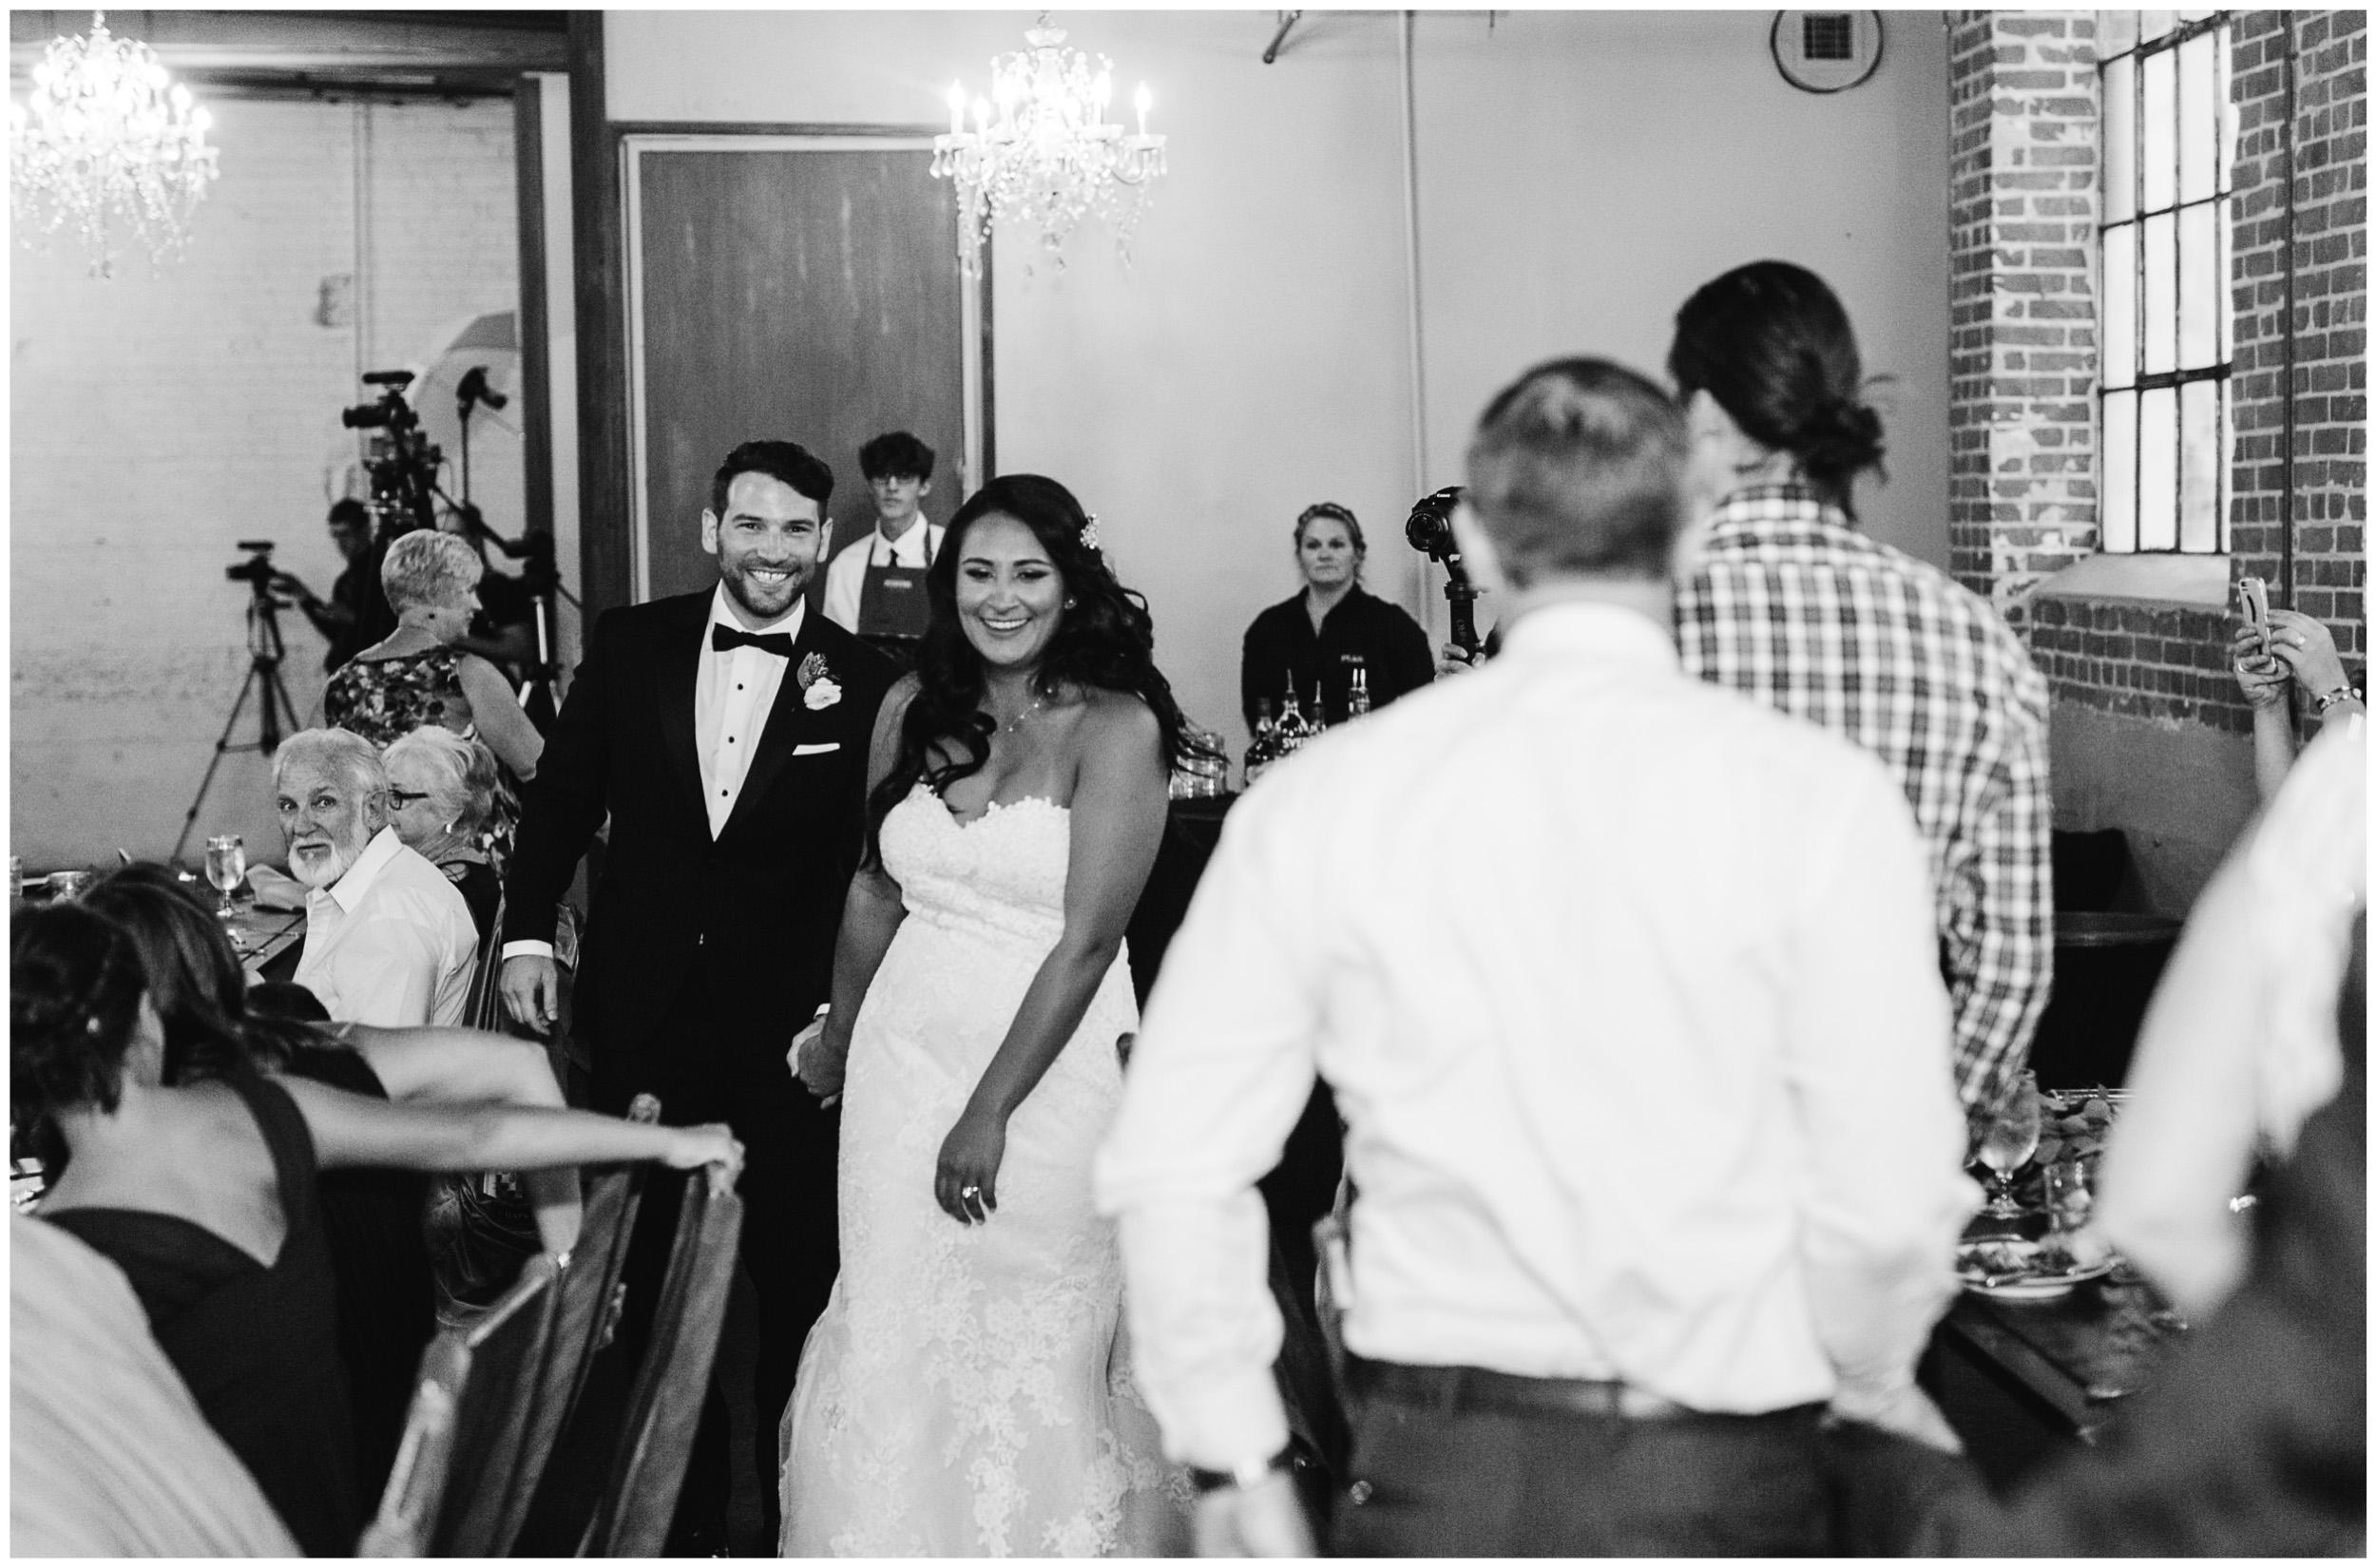 moss_denver_wedding_61.jpg